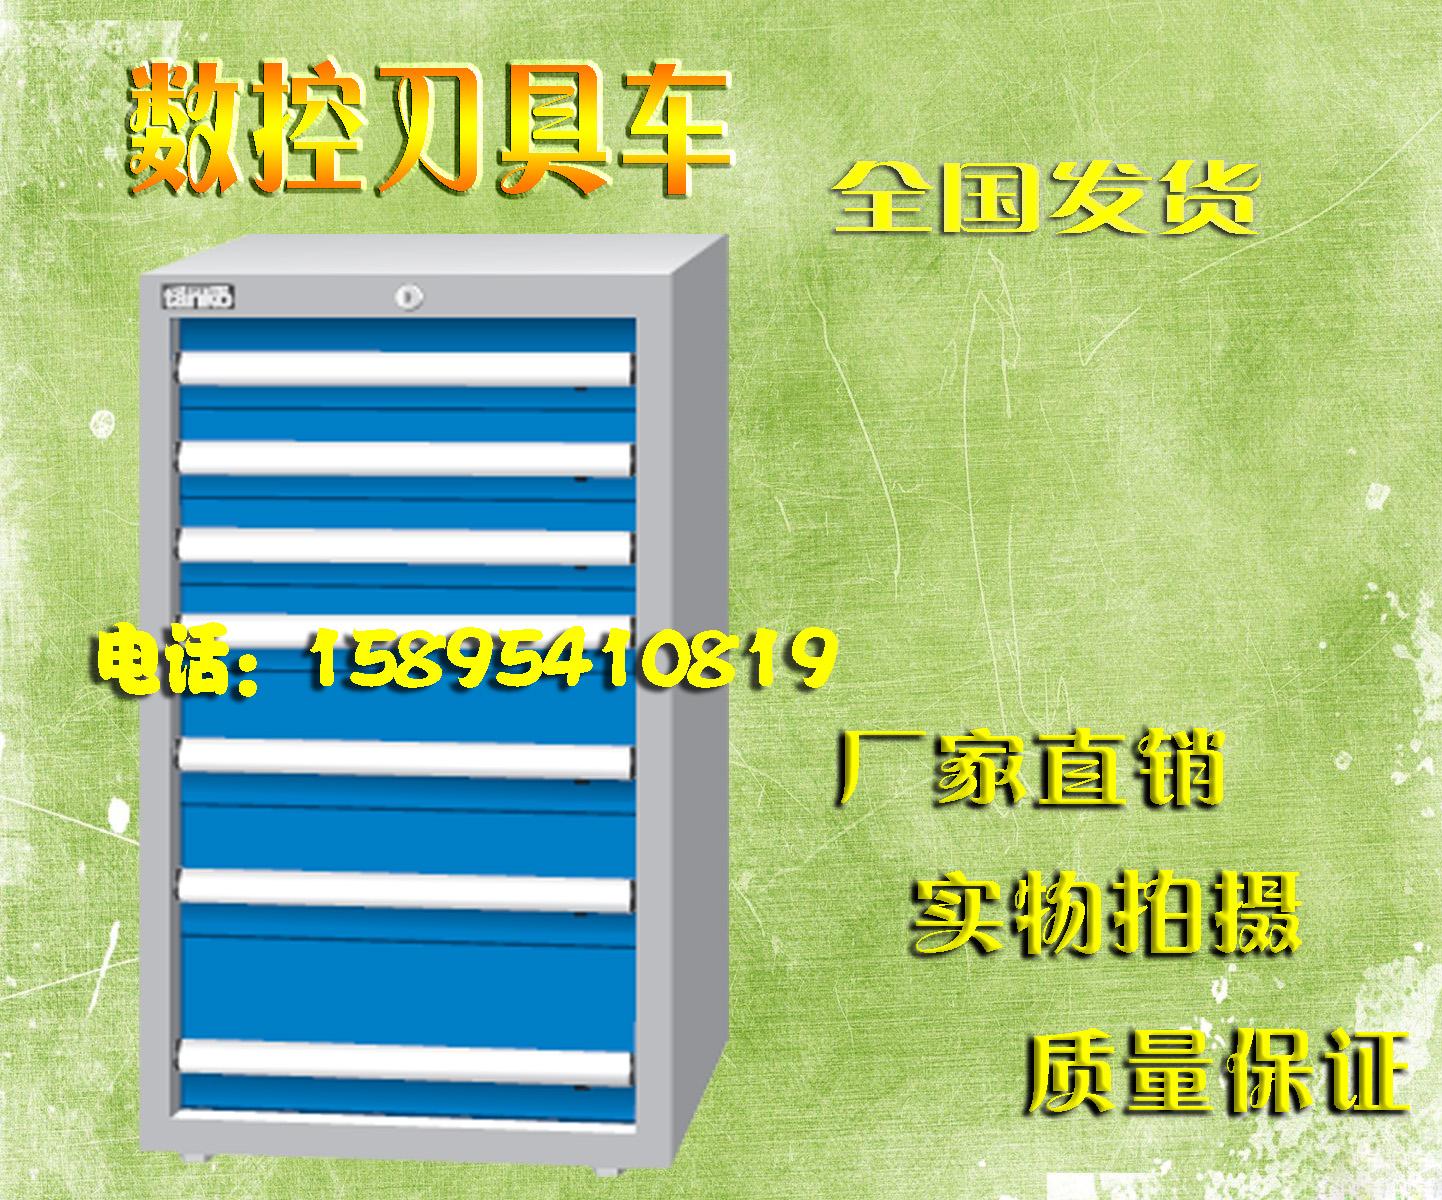 加厚铁皮柜ea-10071零件车